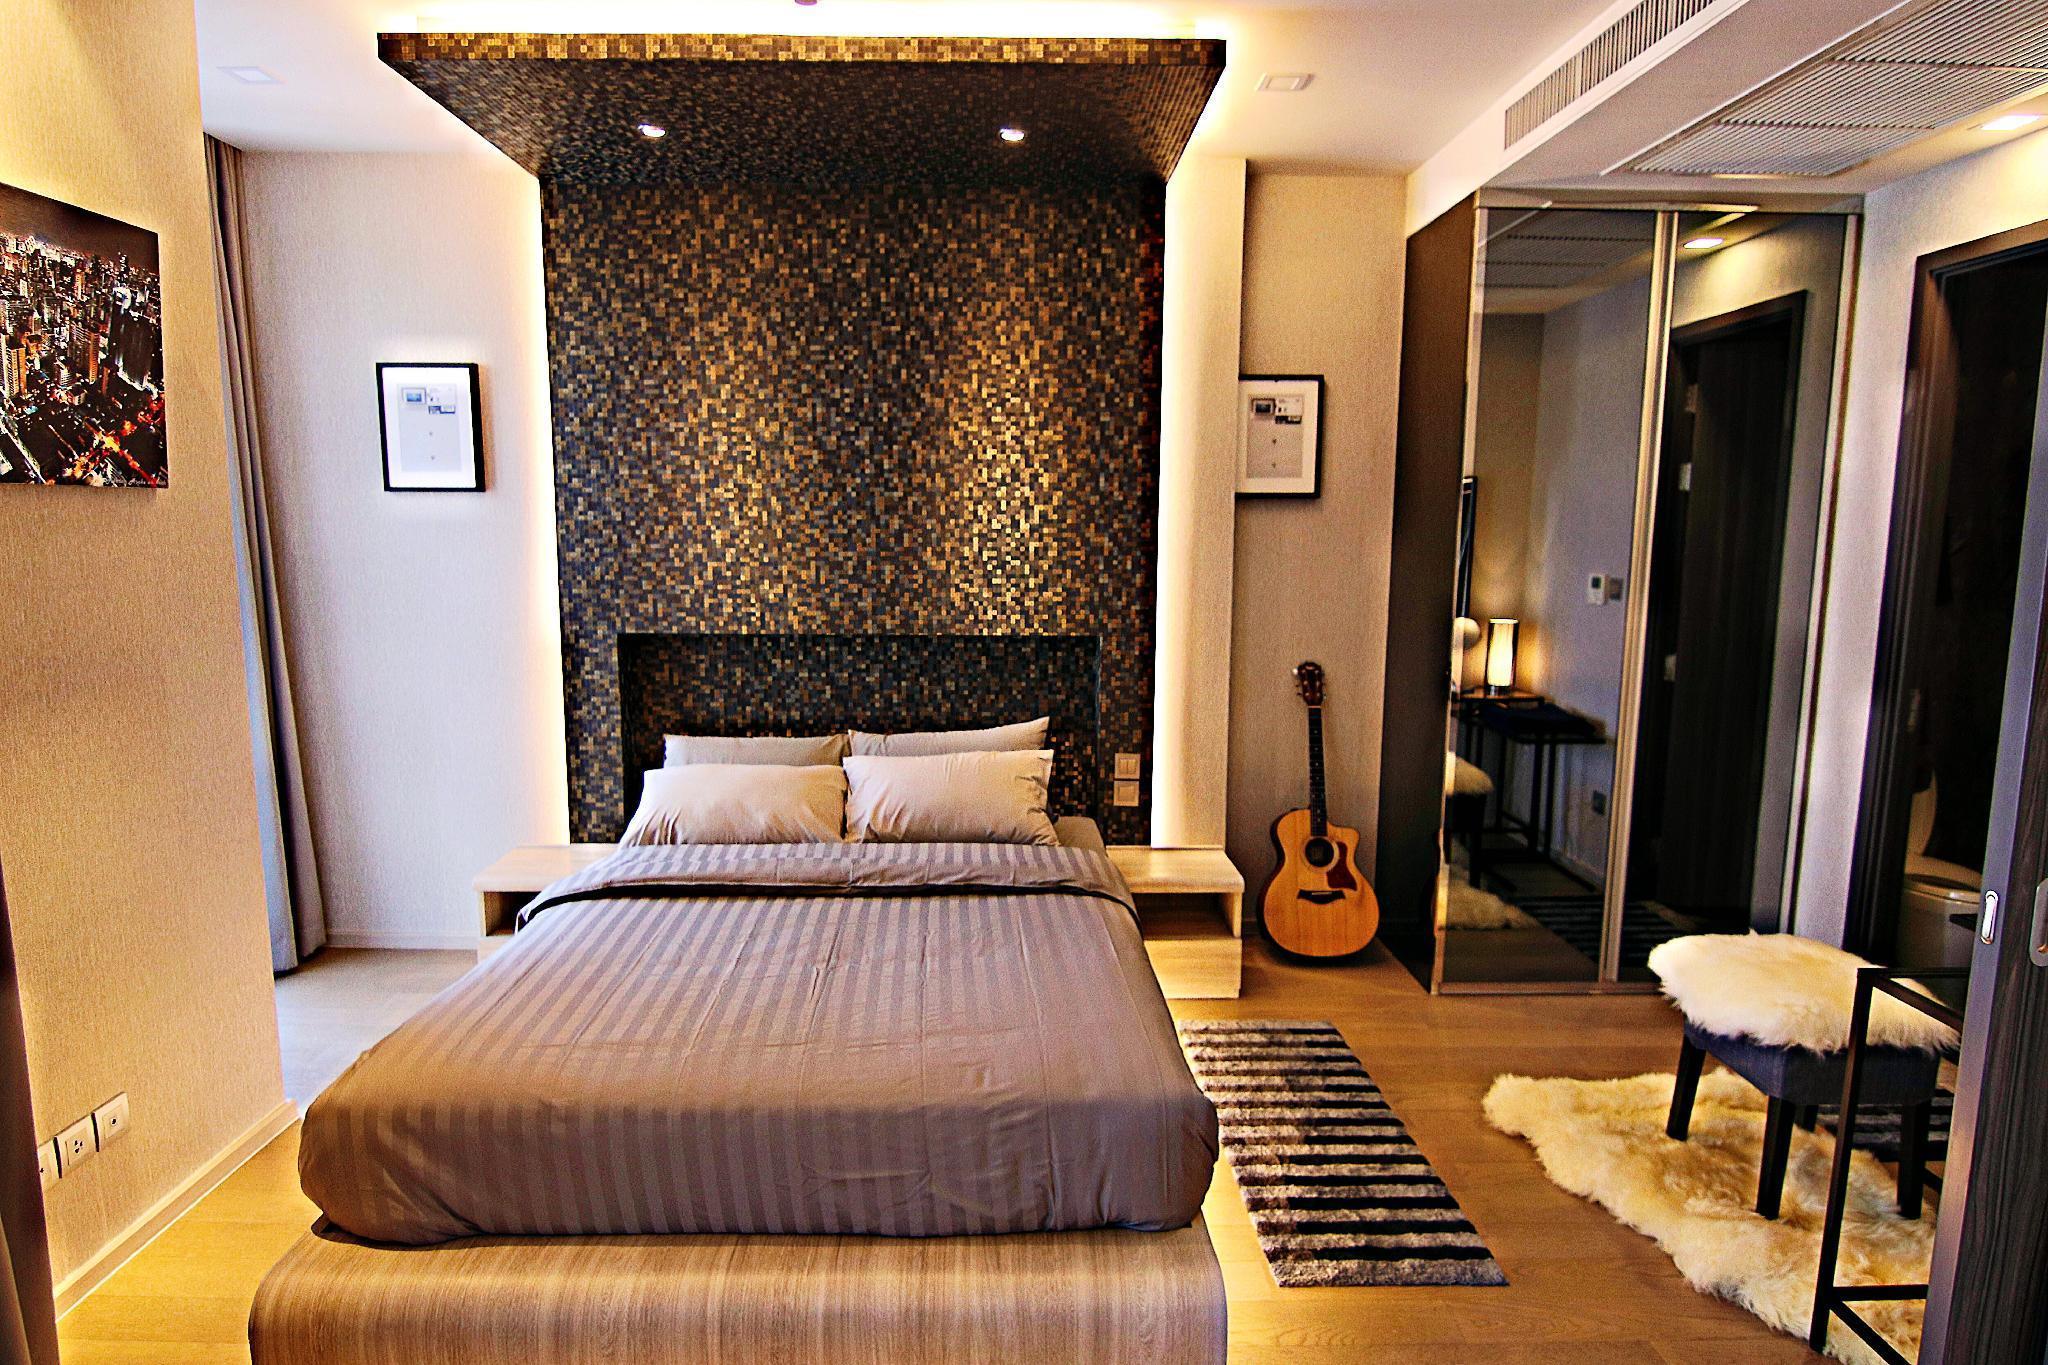 Luxurious & Romantic in the Heart of BKK#H MRT/BTS อพาร์ตเมนต์ 1 ห้องนอน 1 ห้องน้ำส่วนตัว ขนาด 35 ตร.ม. – สุขุมวิท